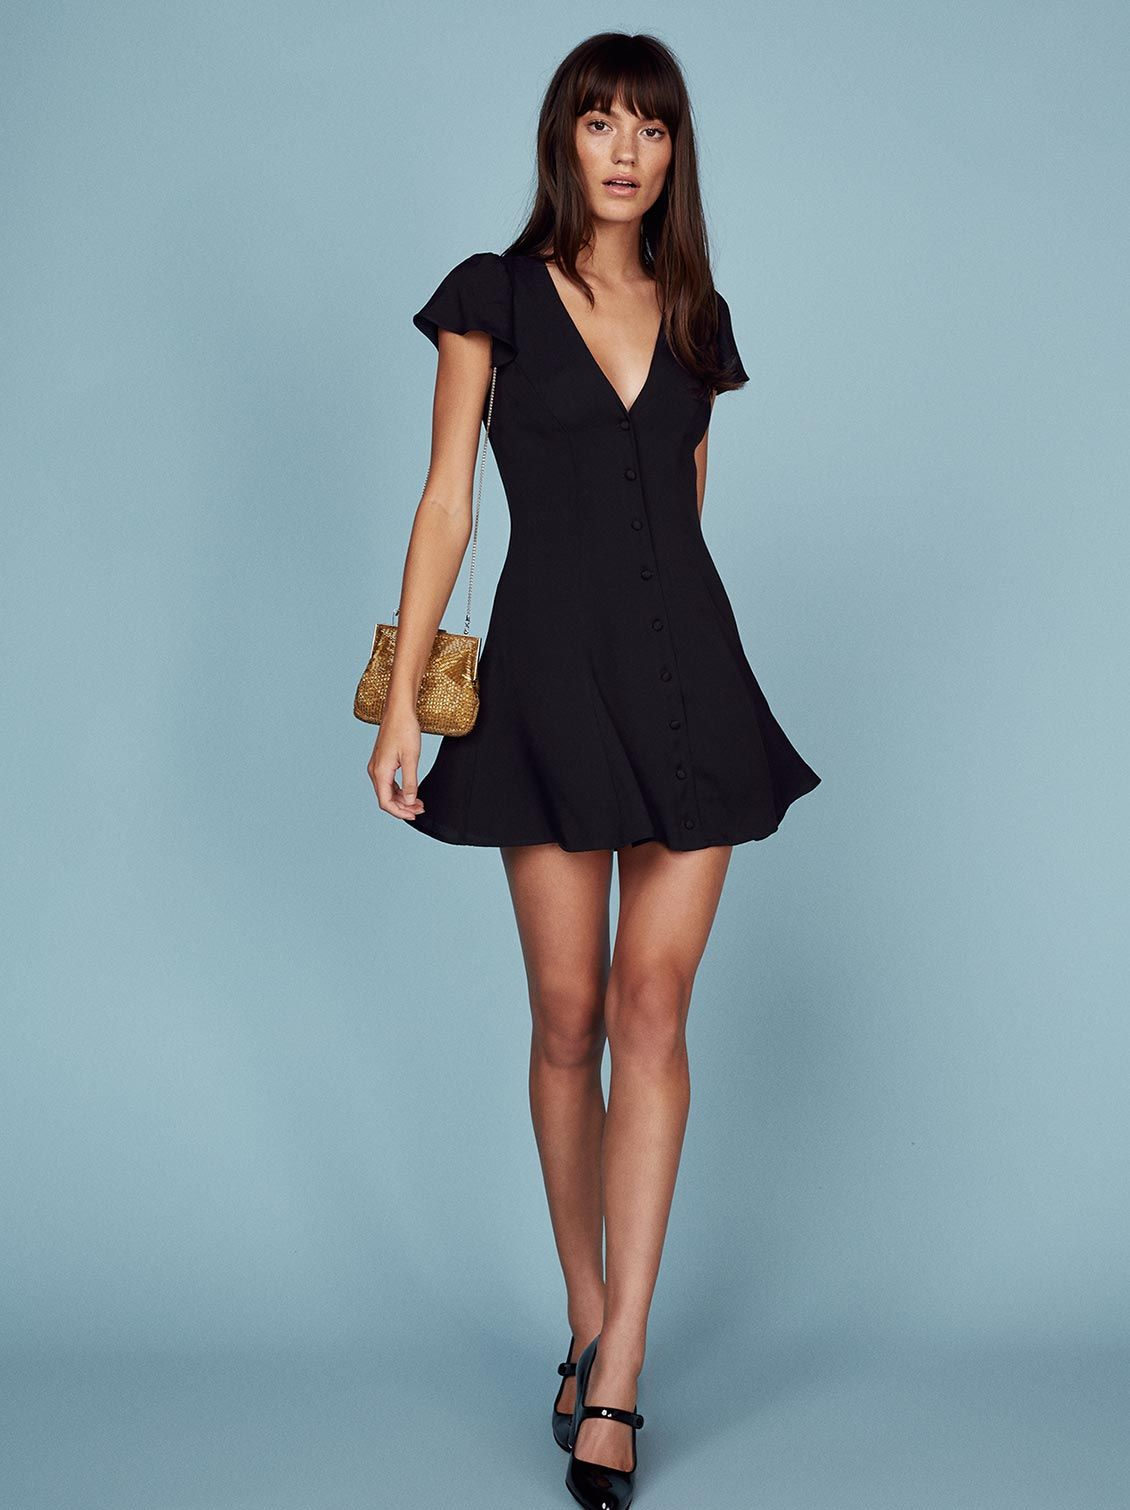 Modern Little Black Dress For Party Photos - All Wedding Dresses ...